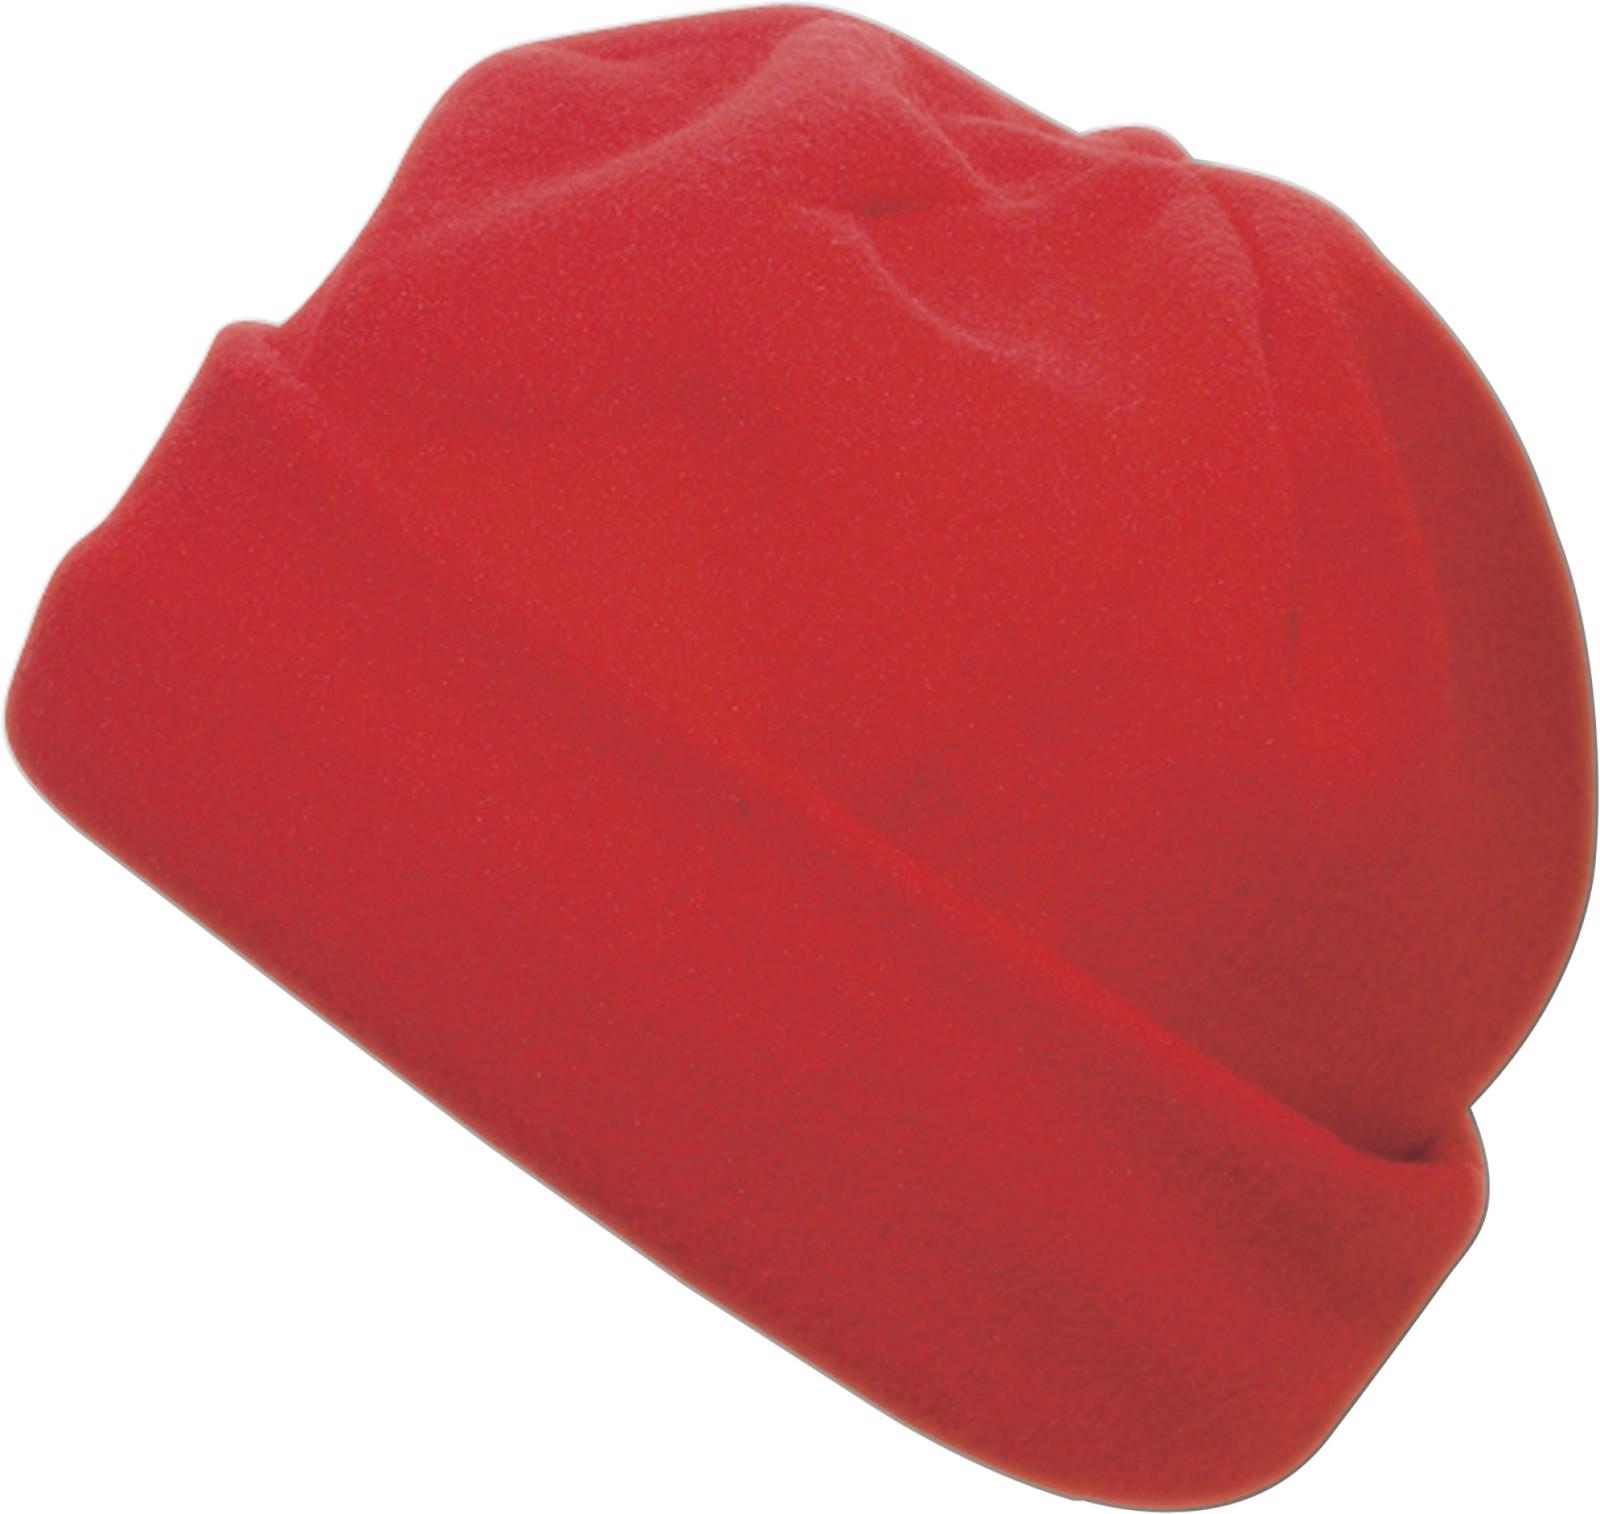 Polyester fleece (200 gr/m²) beanie - Red